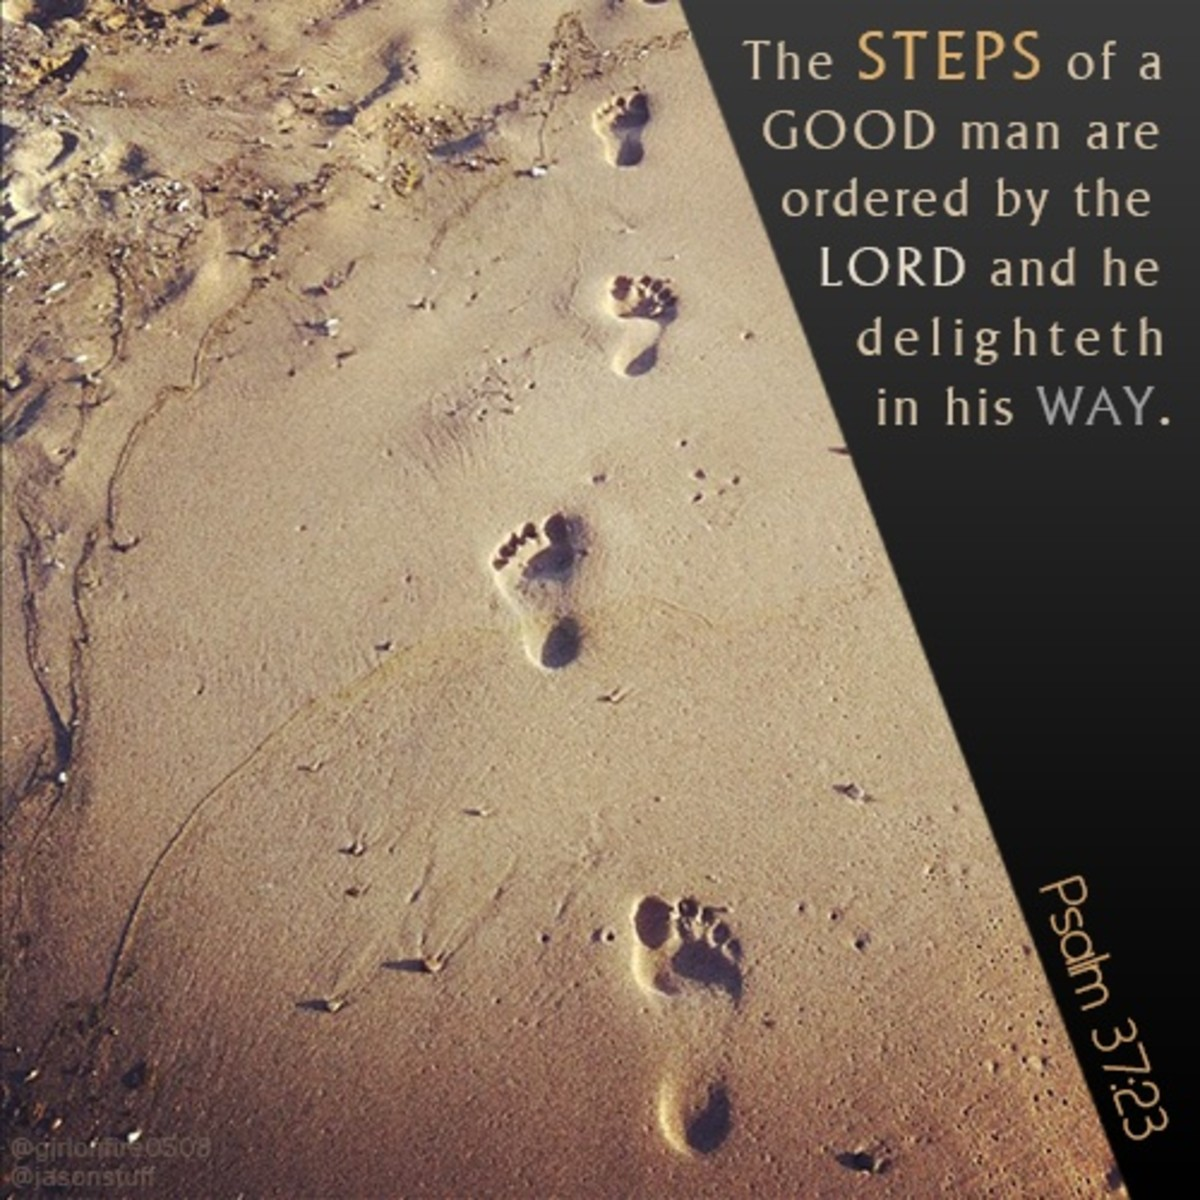 God guides us everywhere we go.